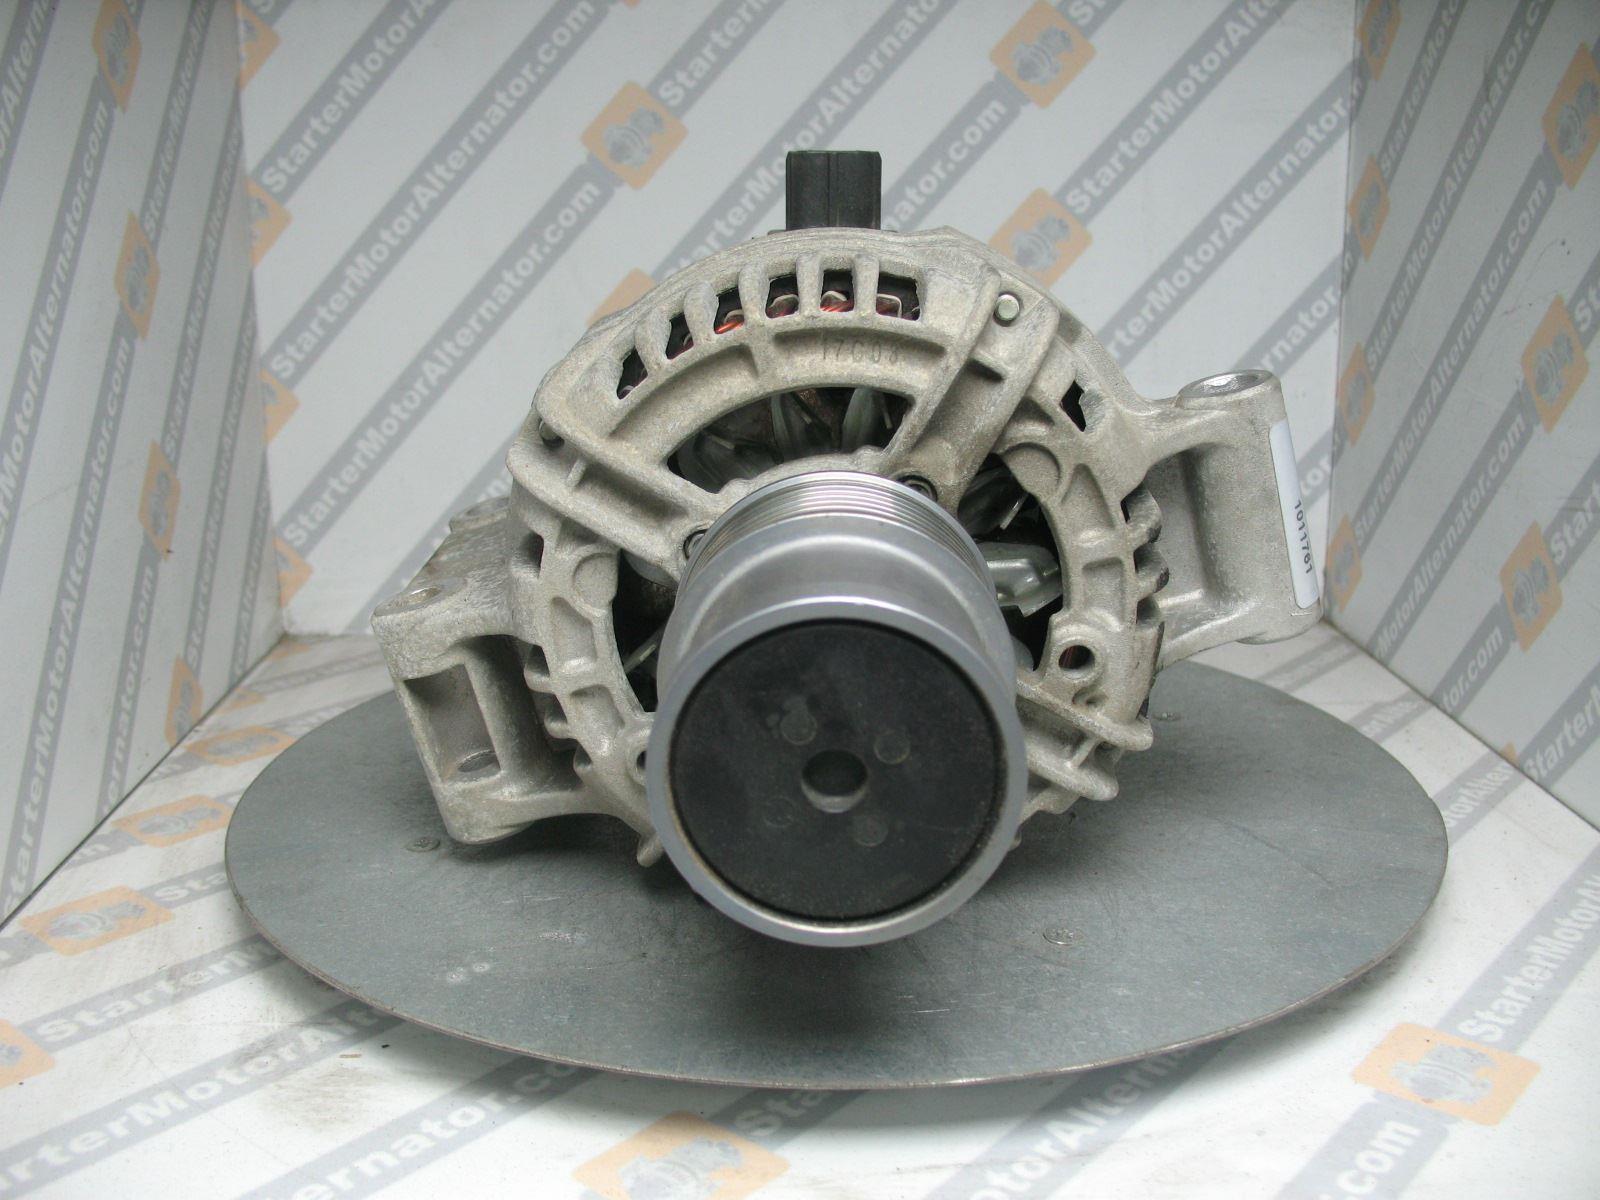 XIA4244 Alternator For Ford / LDV / LTI